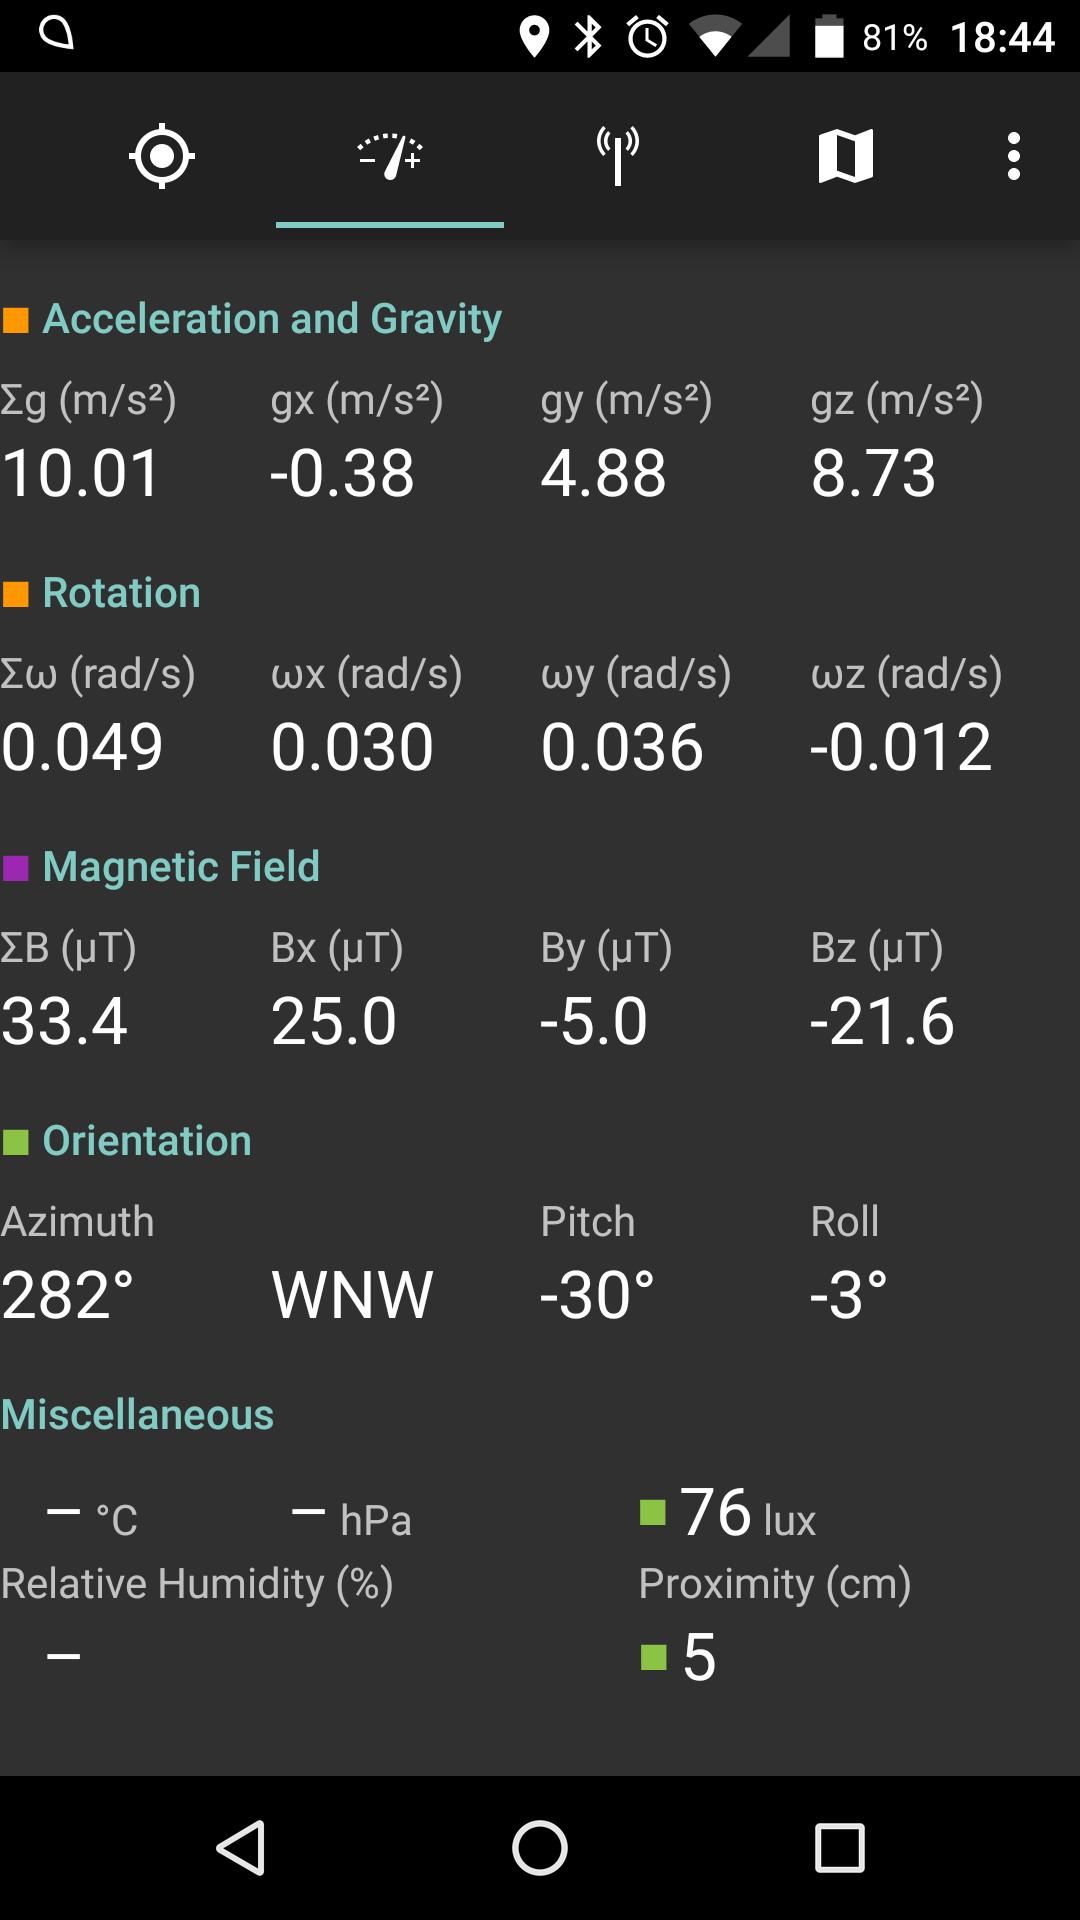 Sensor view in SatStat